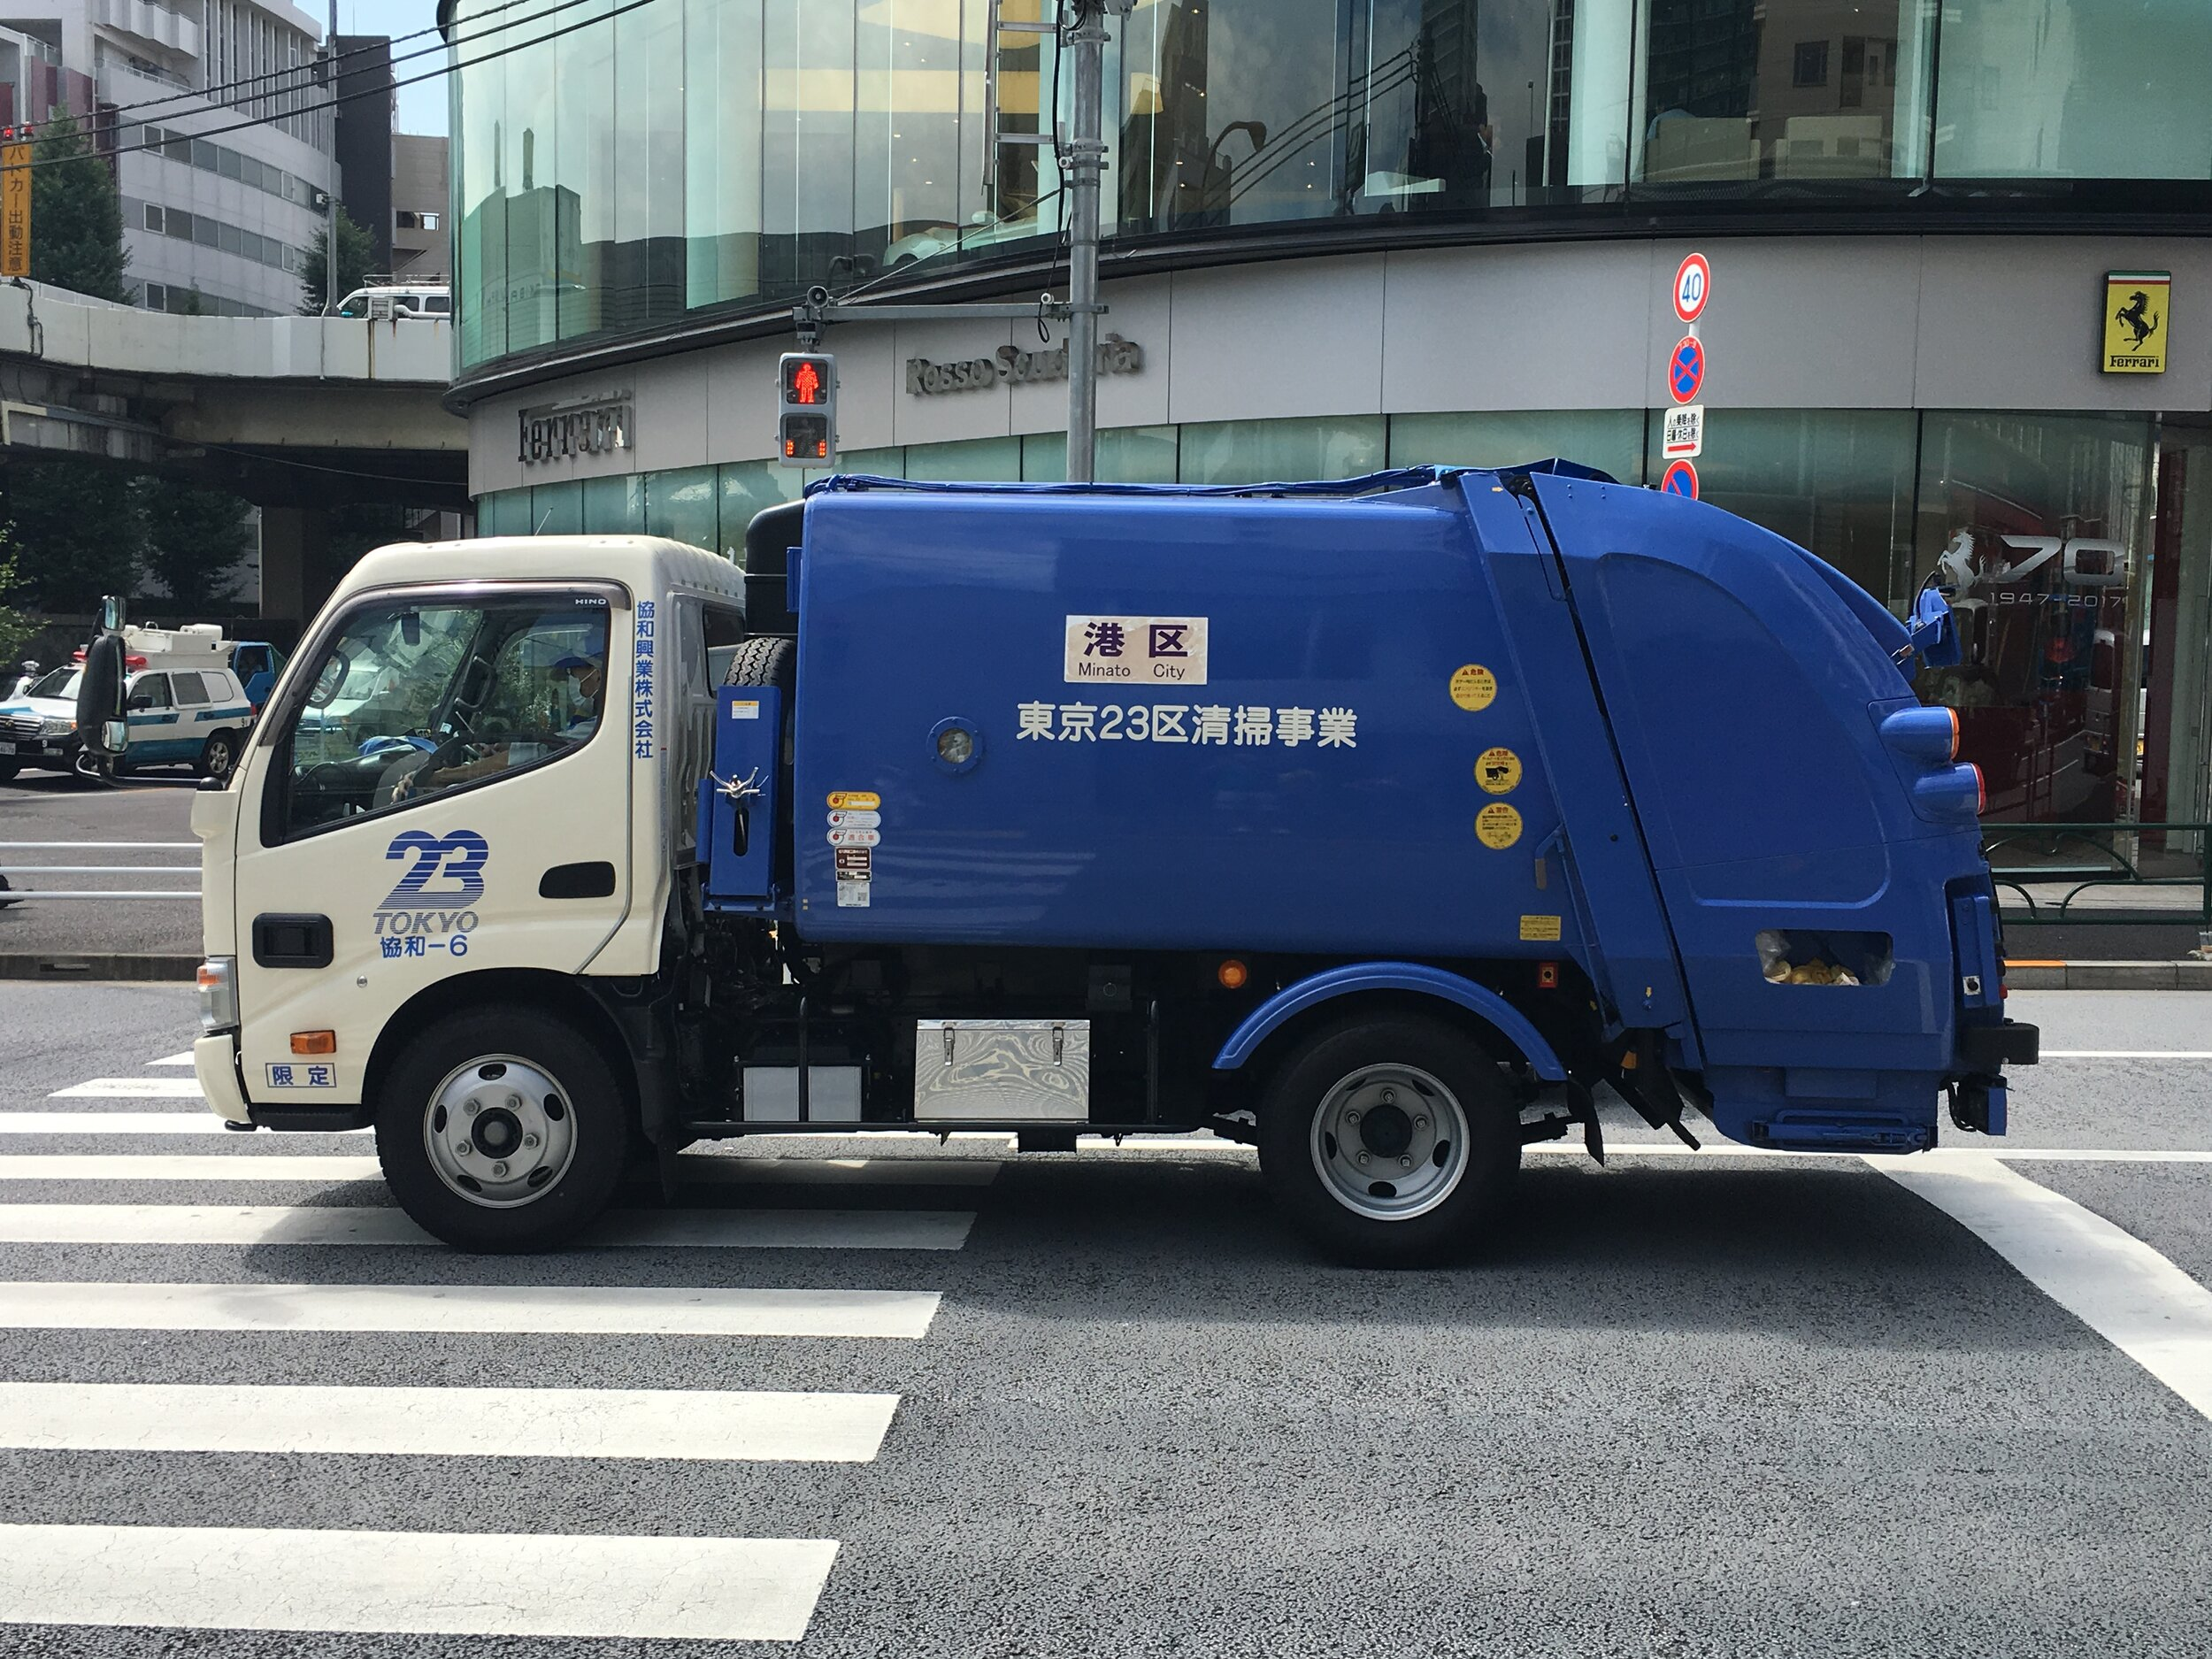 Camion de basura en Tokio